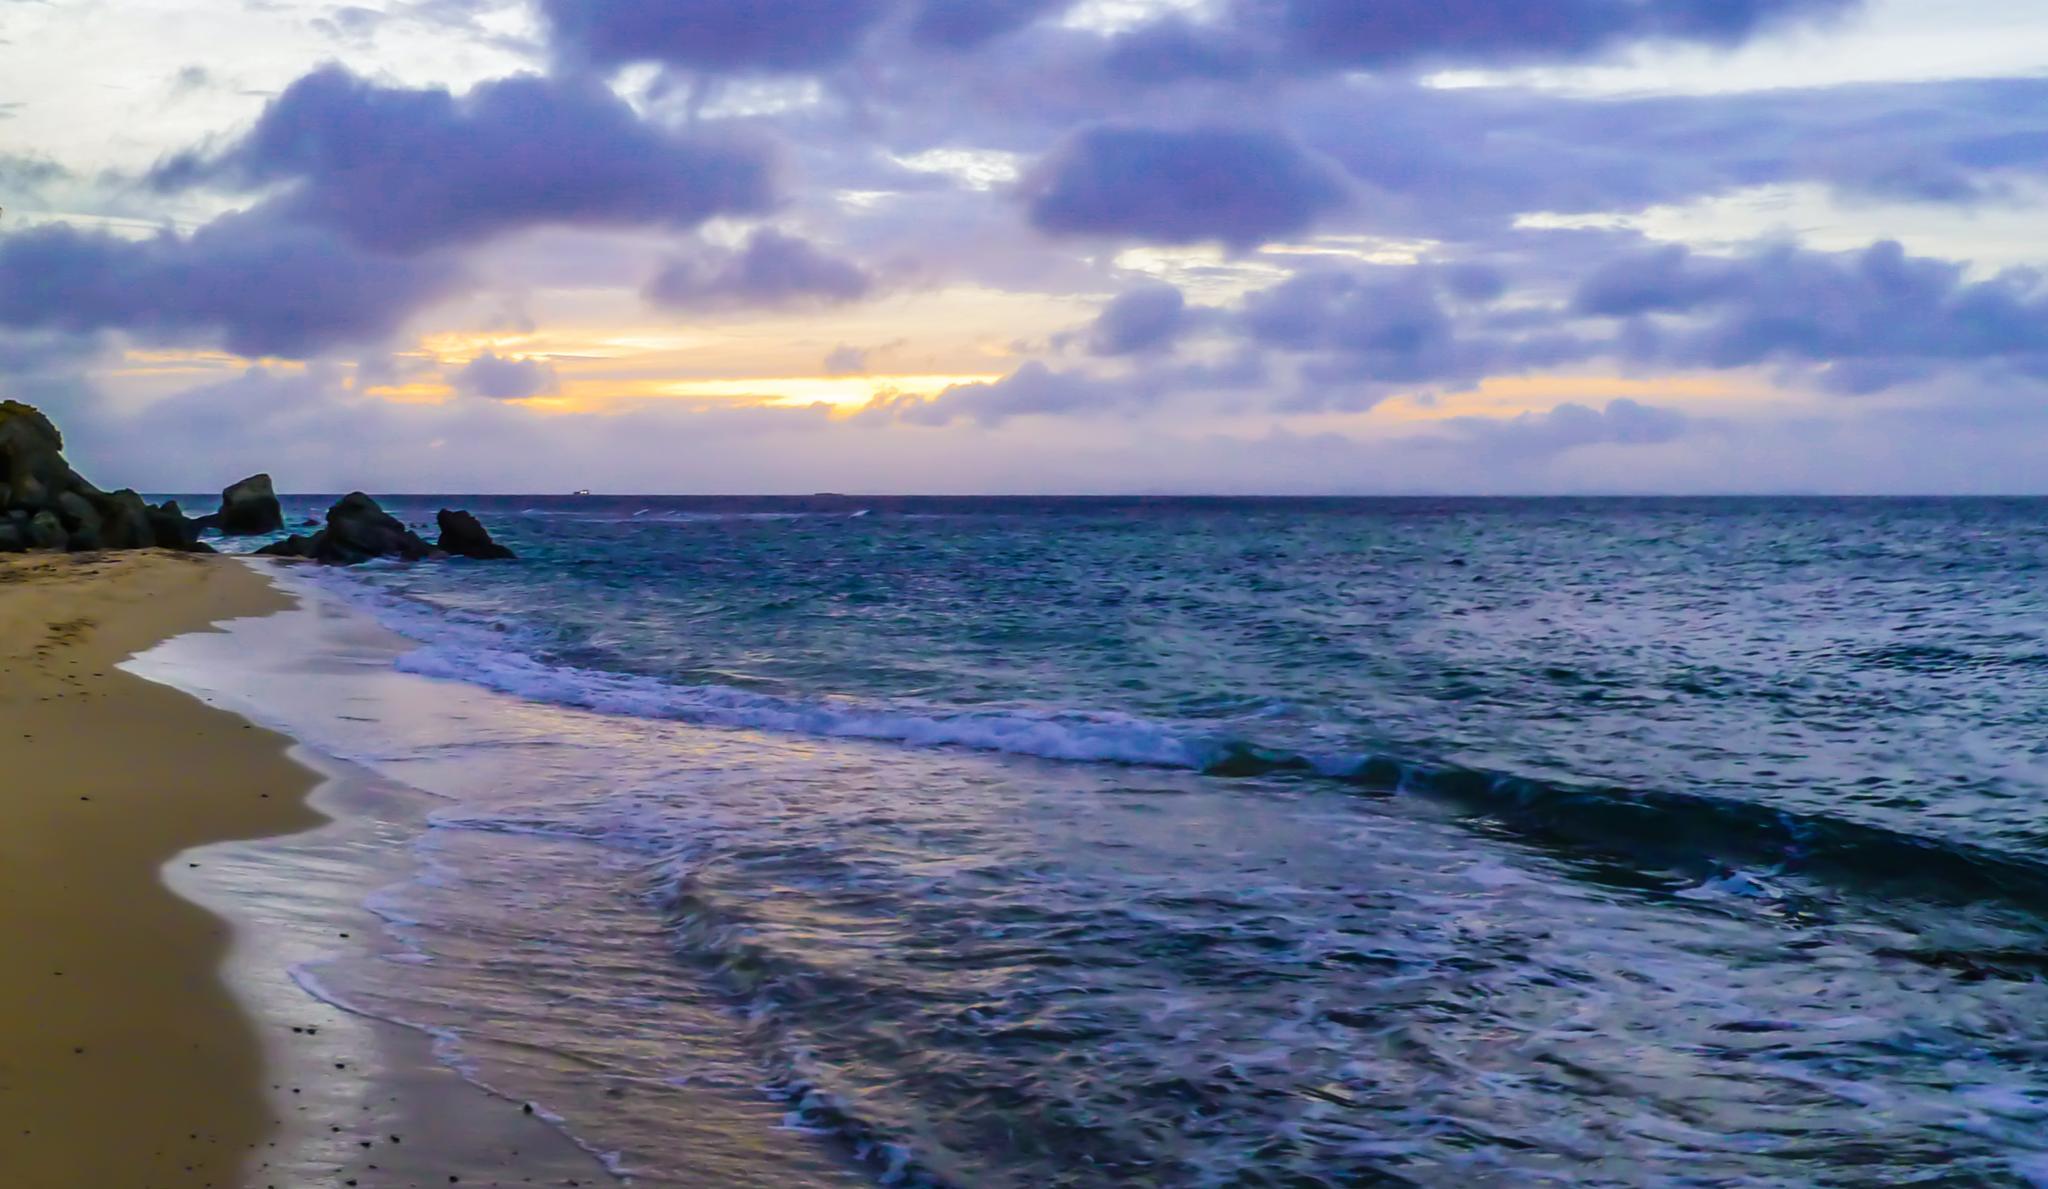 Beach Sunset by Cait Templeton